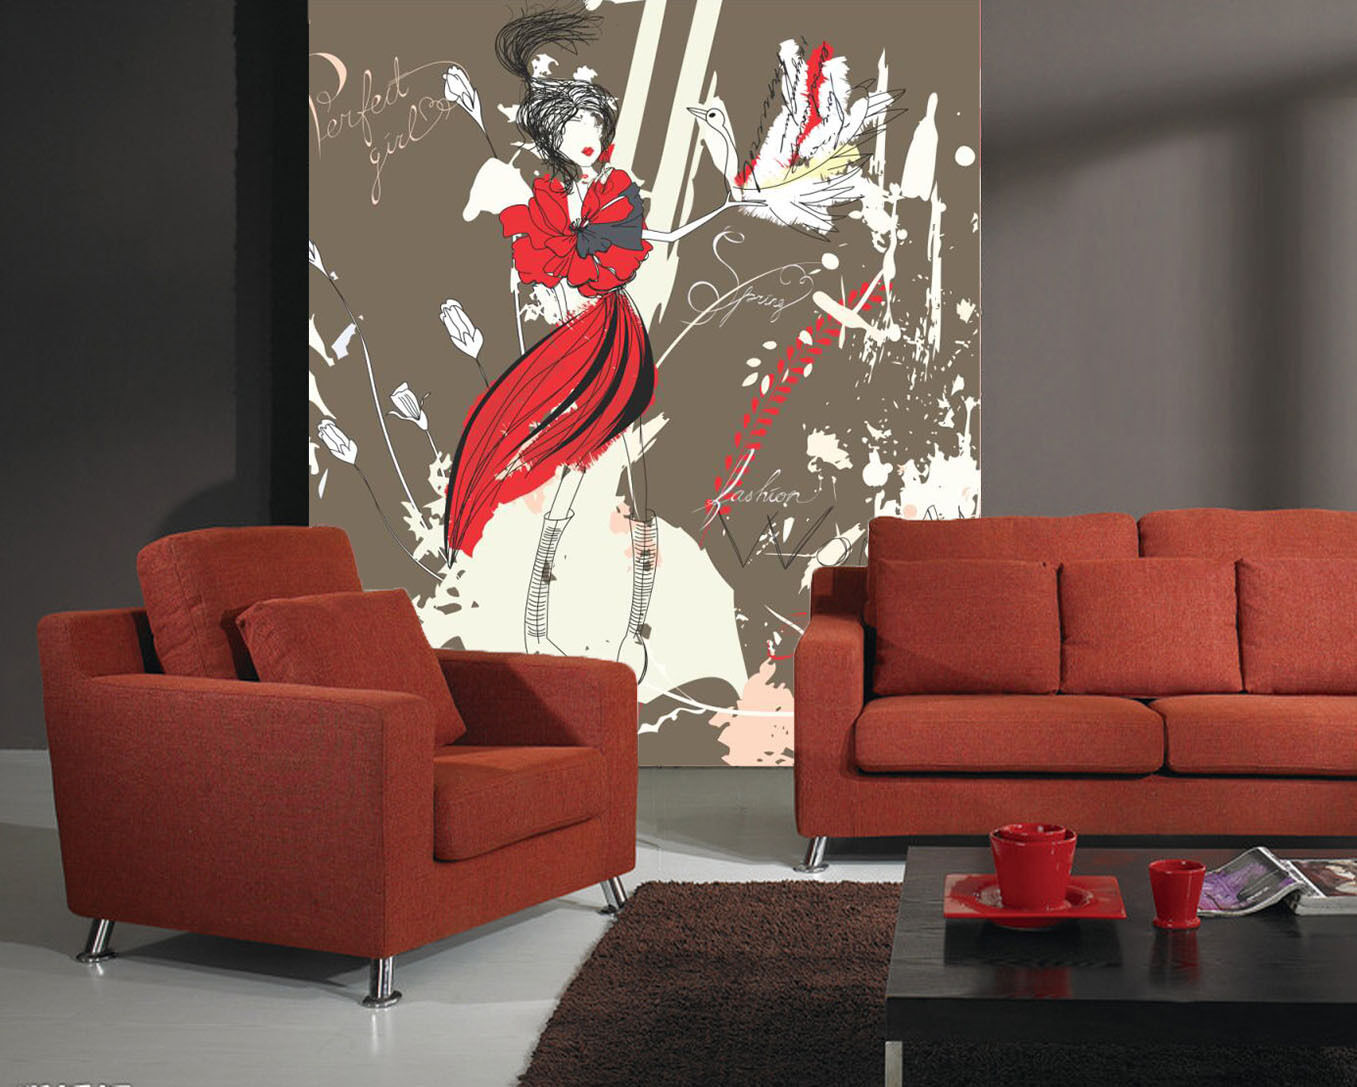 3D Graffiti Ethnic Girl 855 Wall Paper Wall Print Decal Wall Deco Indoor Wall